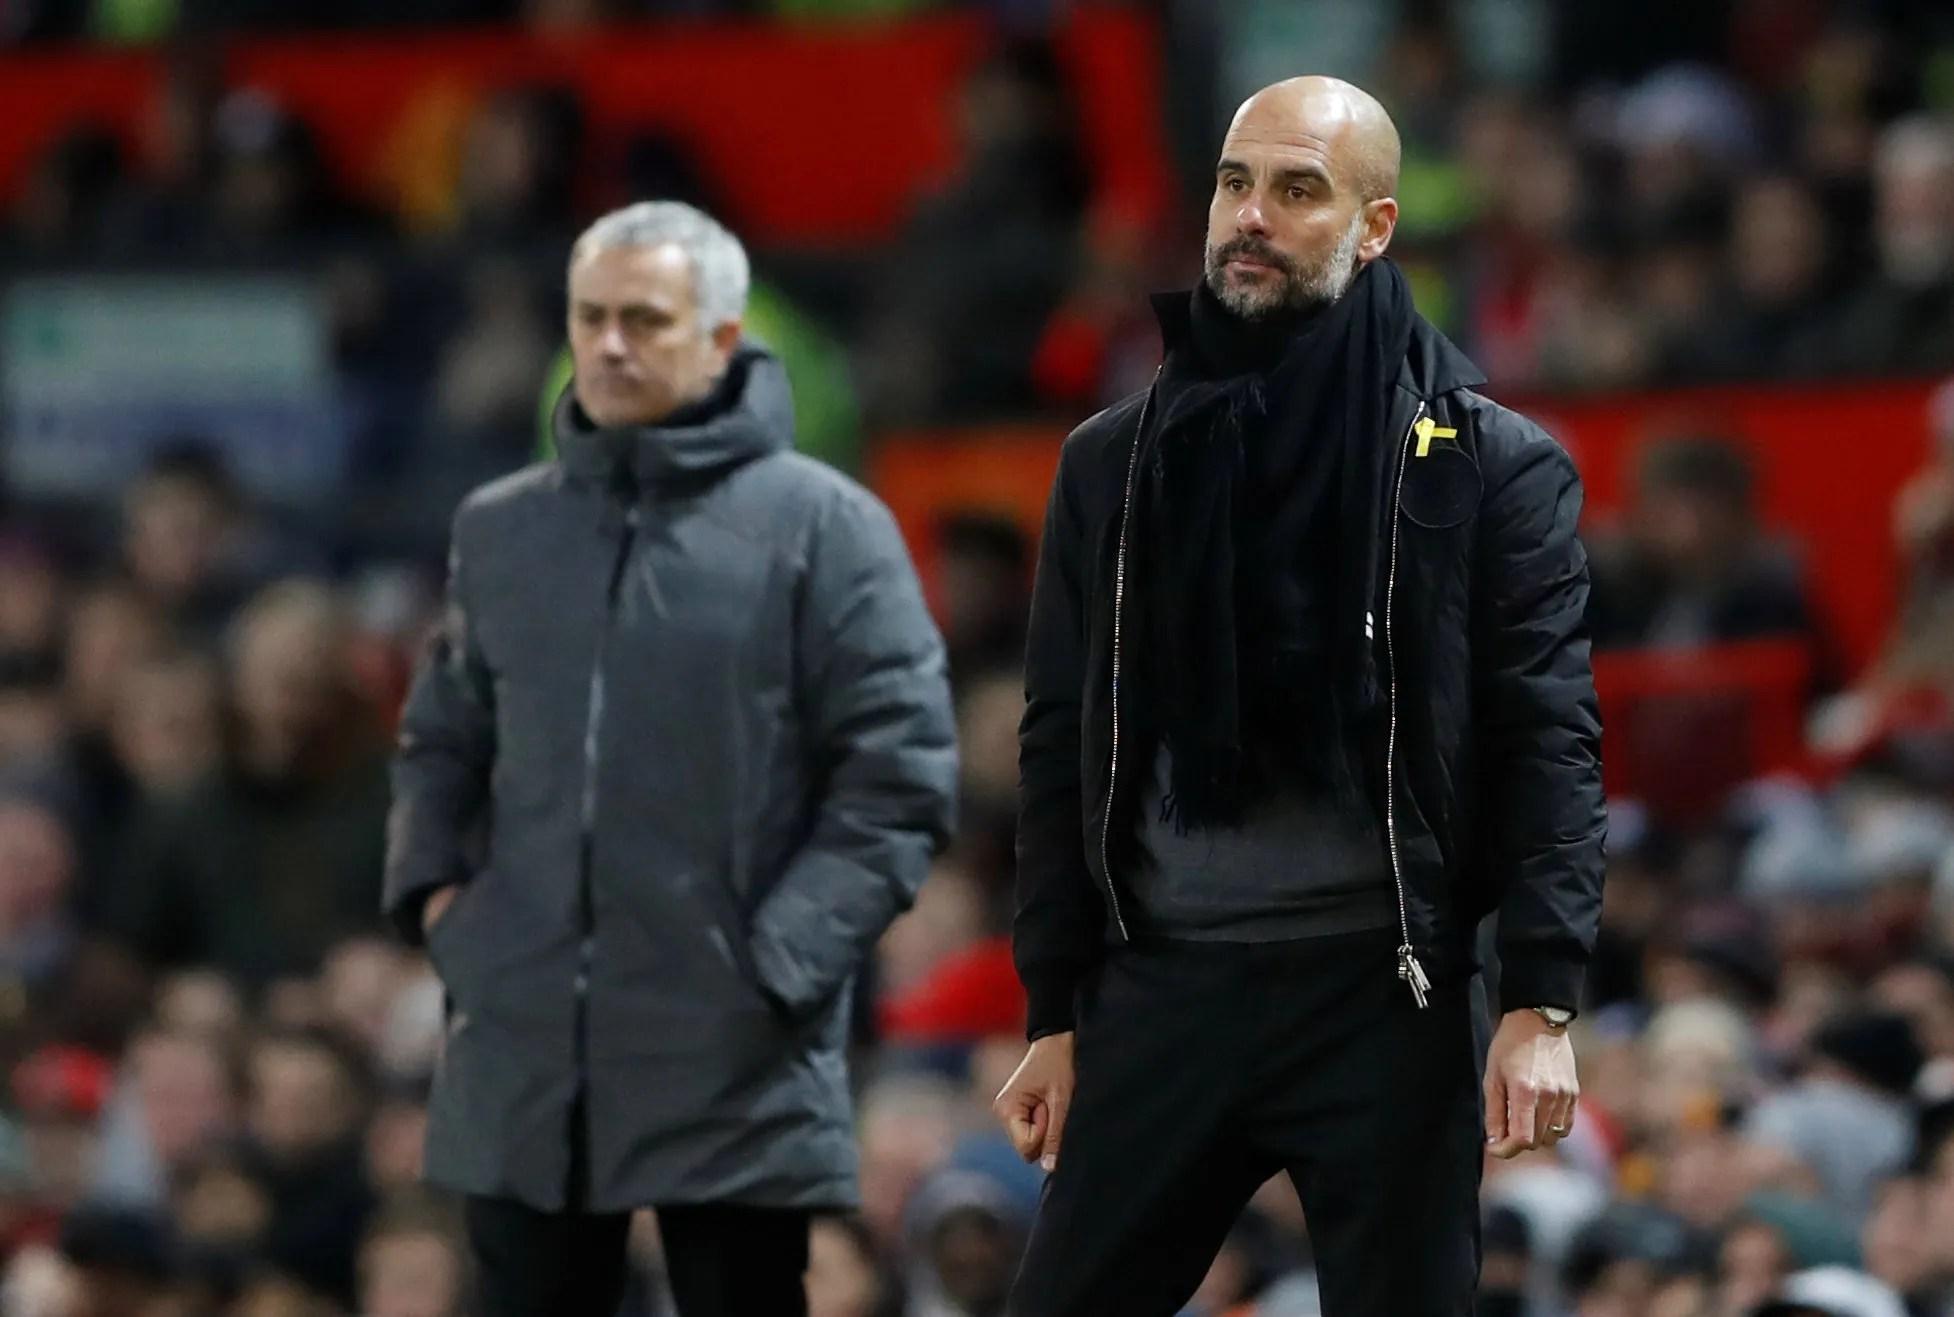 Premier League - Manchester United vs Manchester City - Pep Guardiola and Jose Mourinho